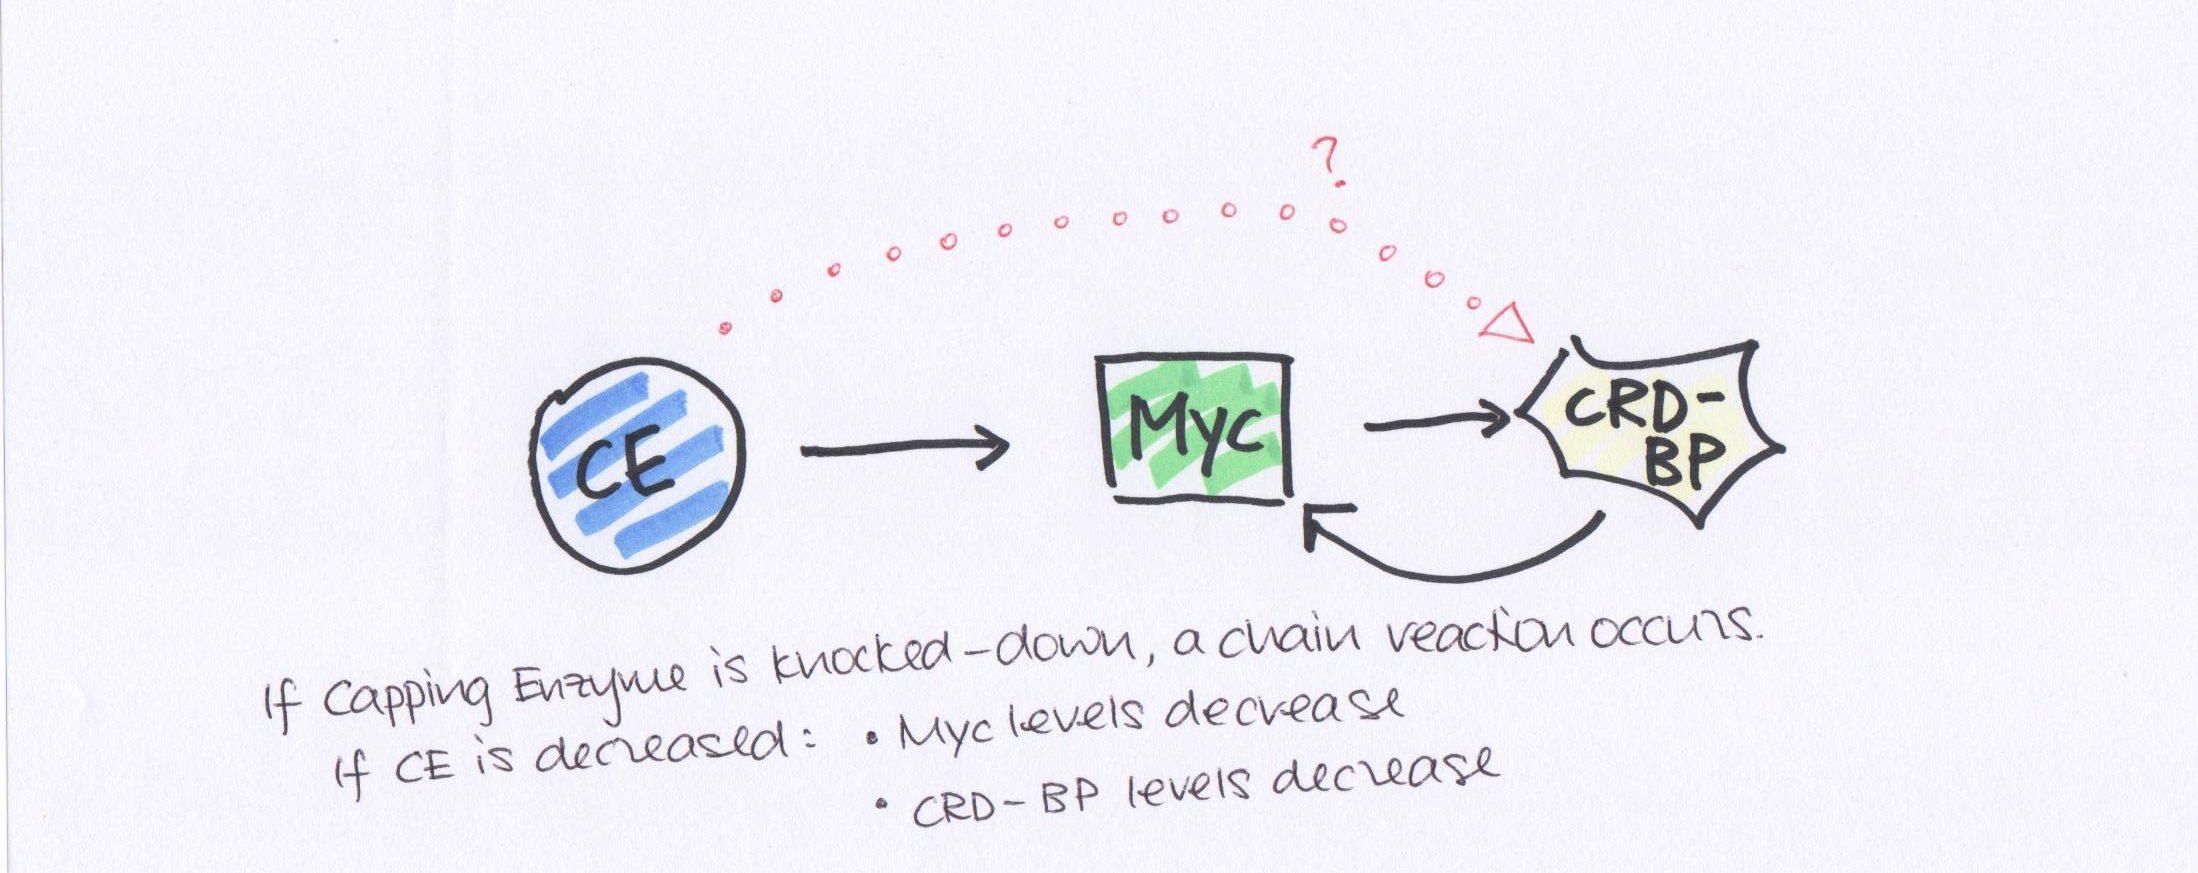 HD:Users:PisliakovaMaria:Desktop:CE myc crdbp.jpeg